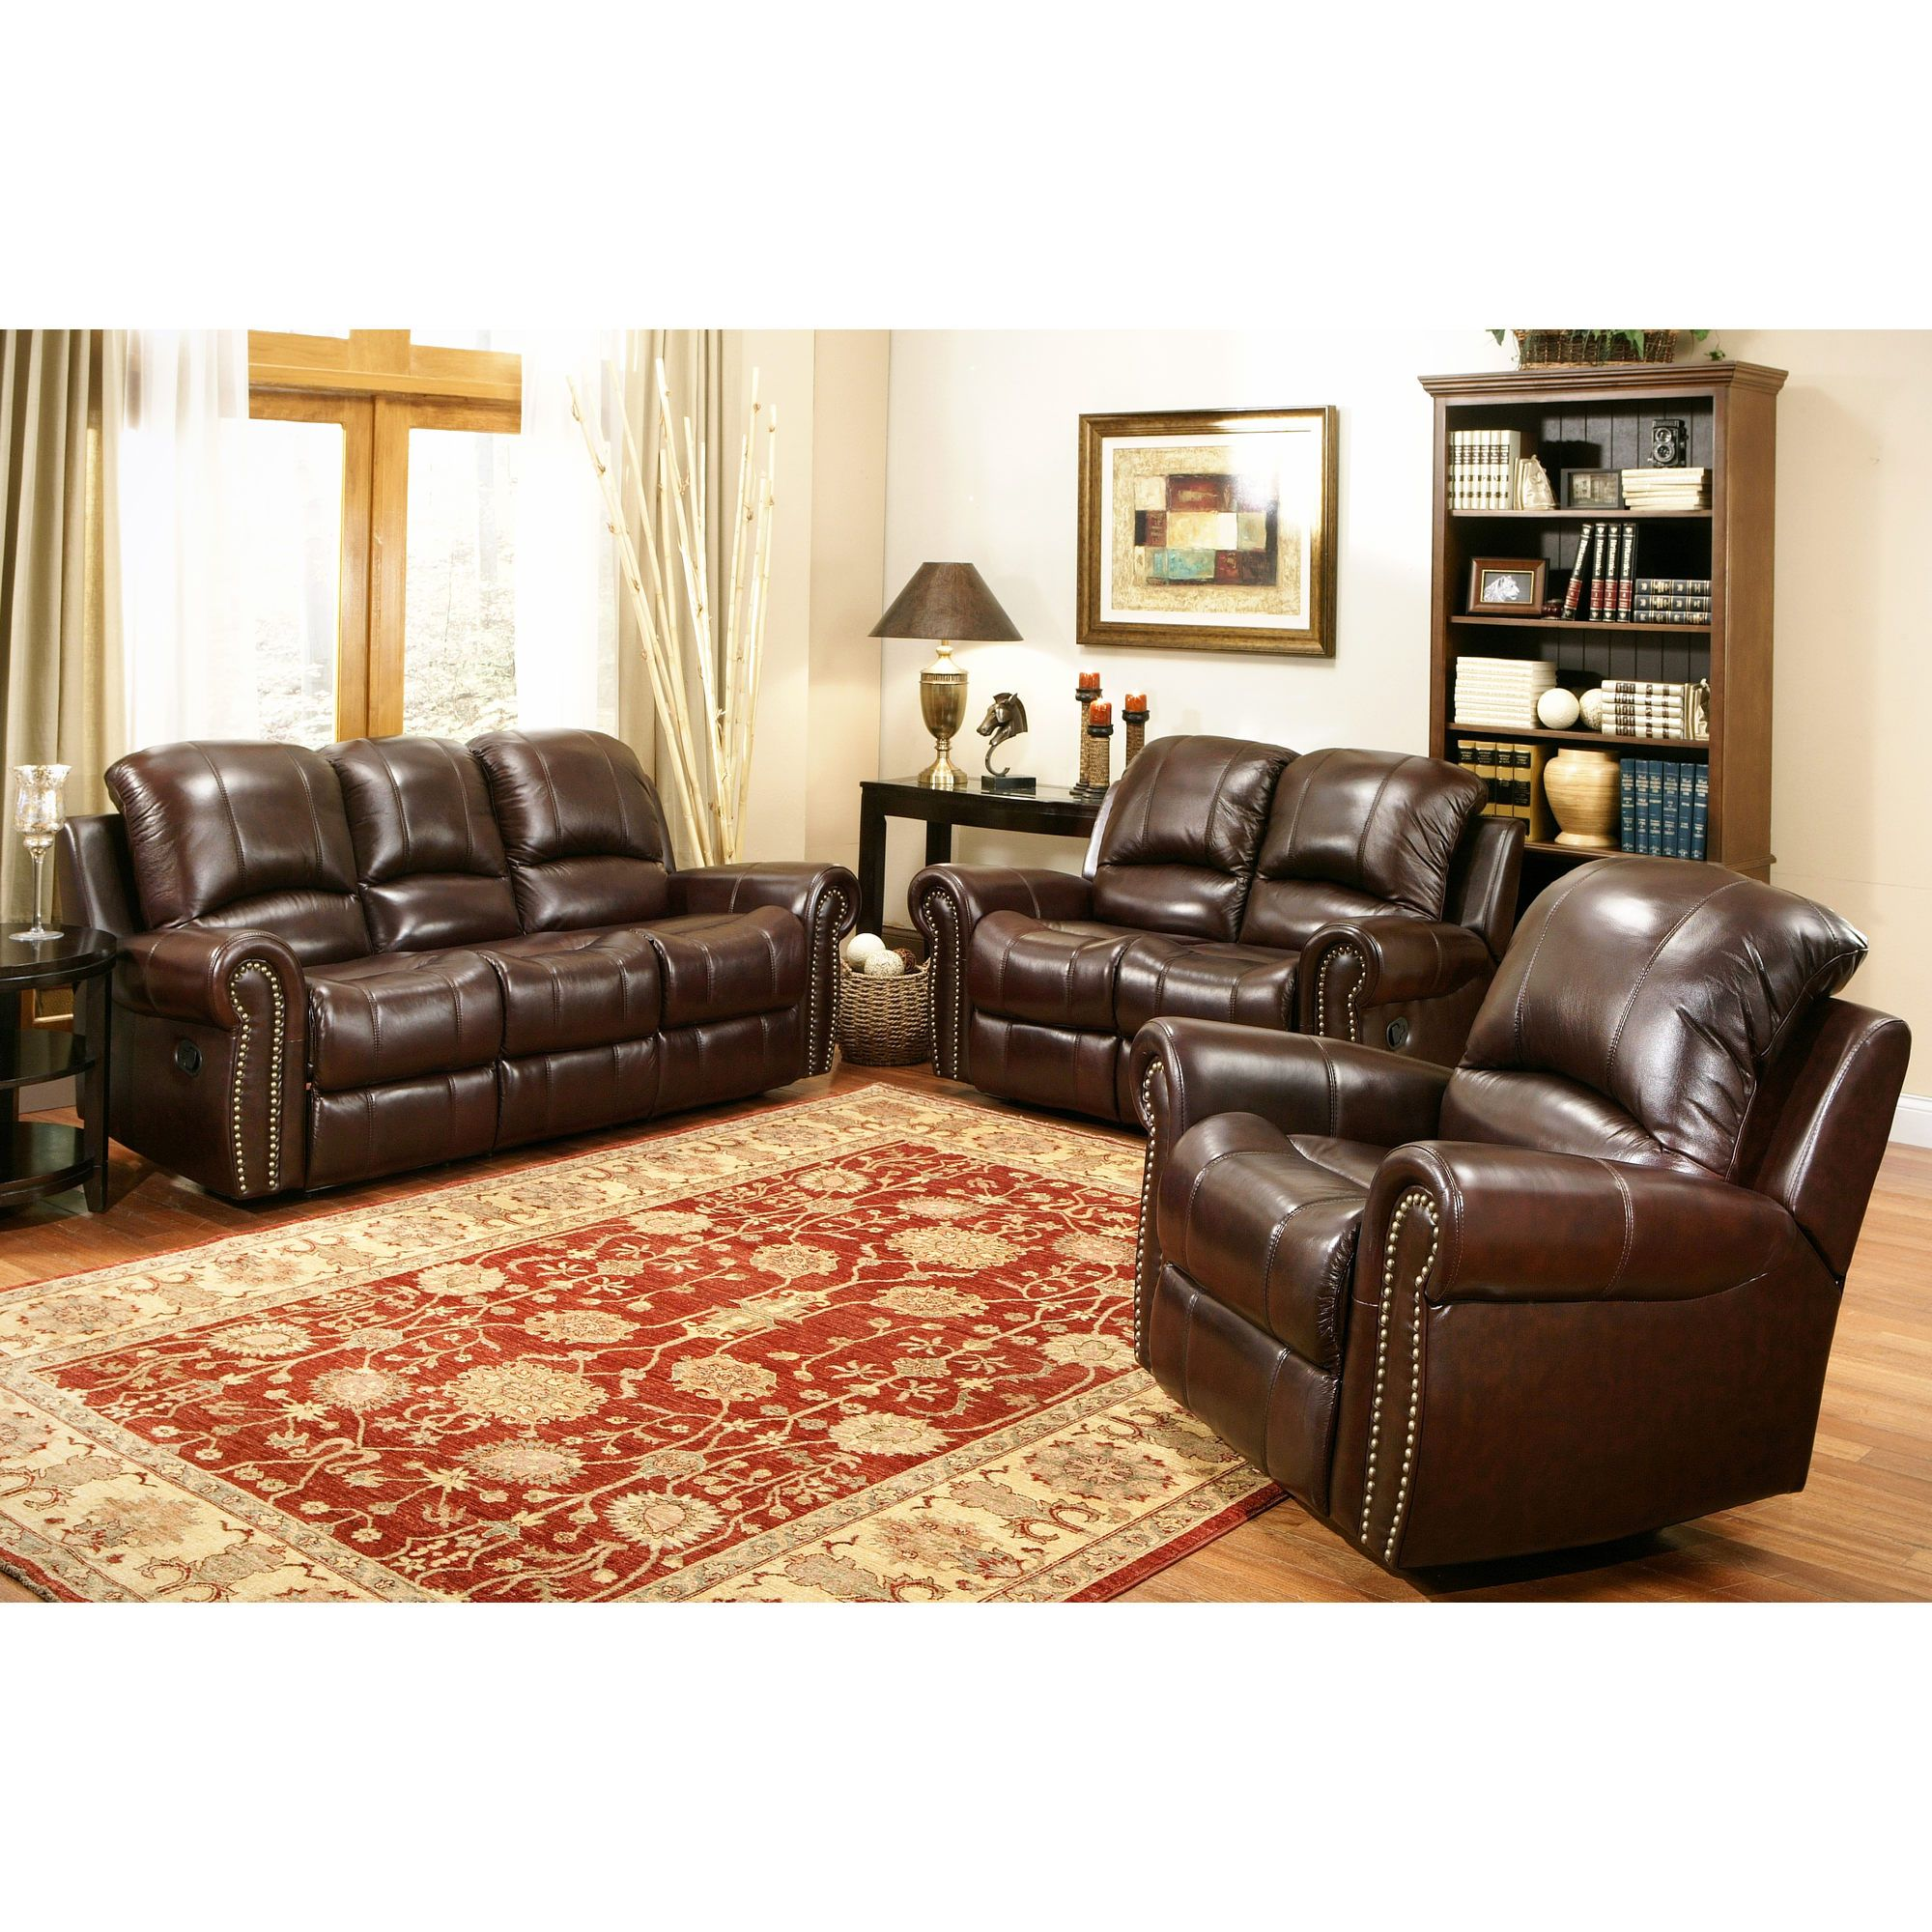 Gentil Abbyson Sofa | Best Sofas Ideas